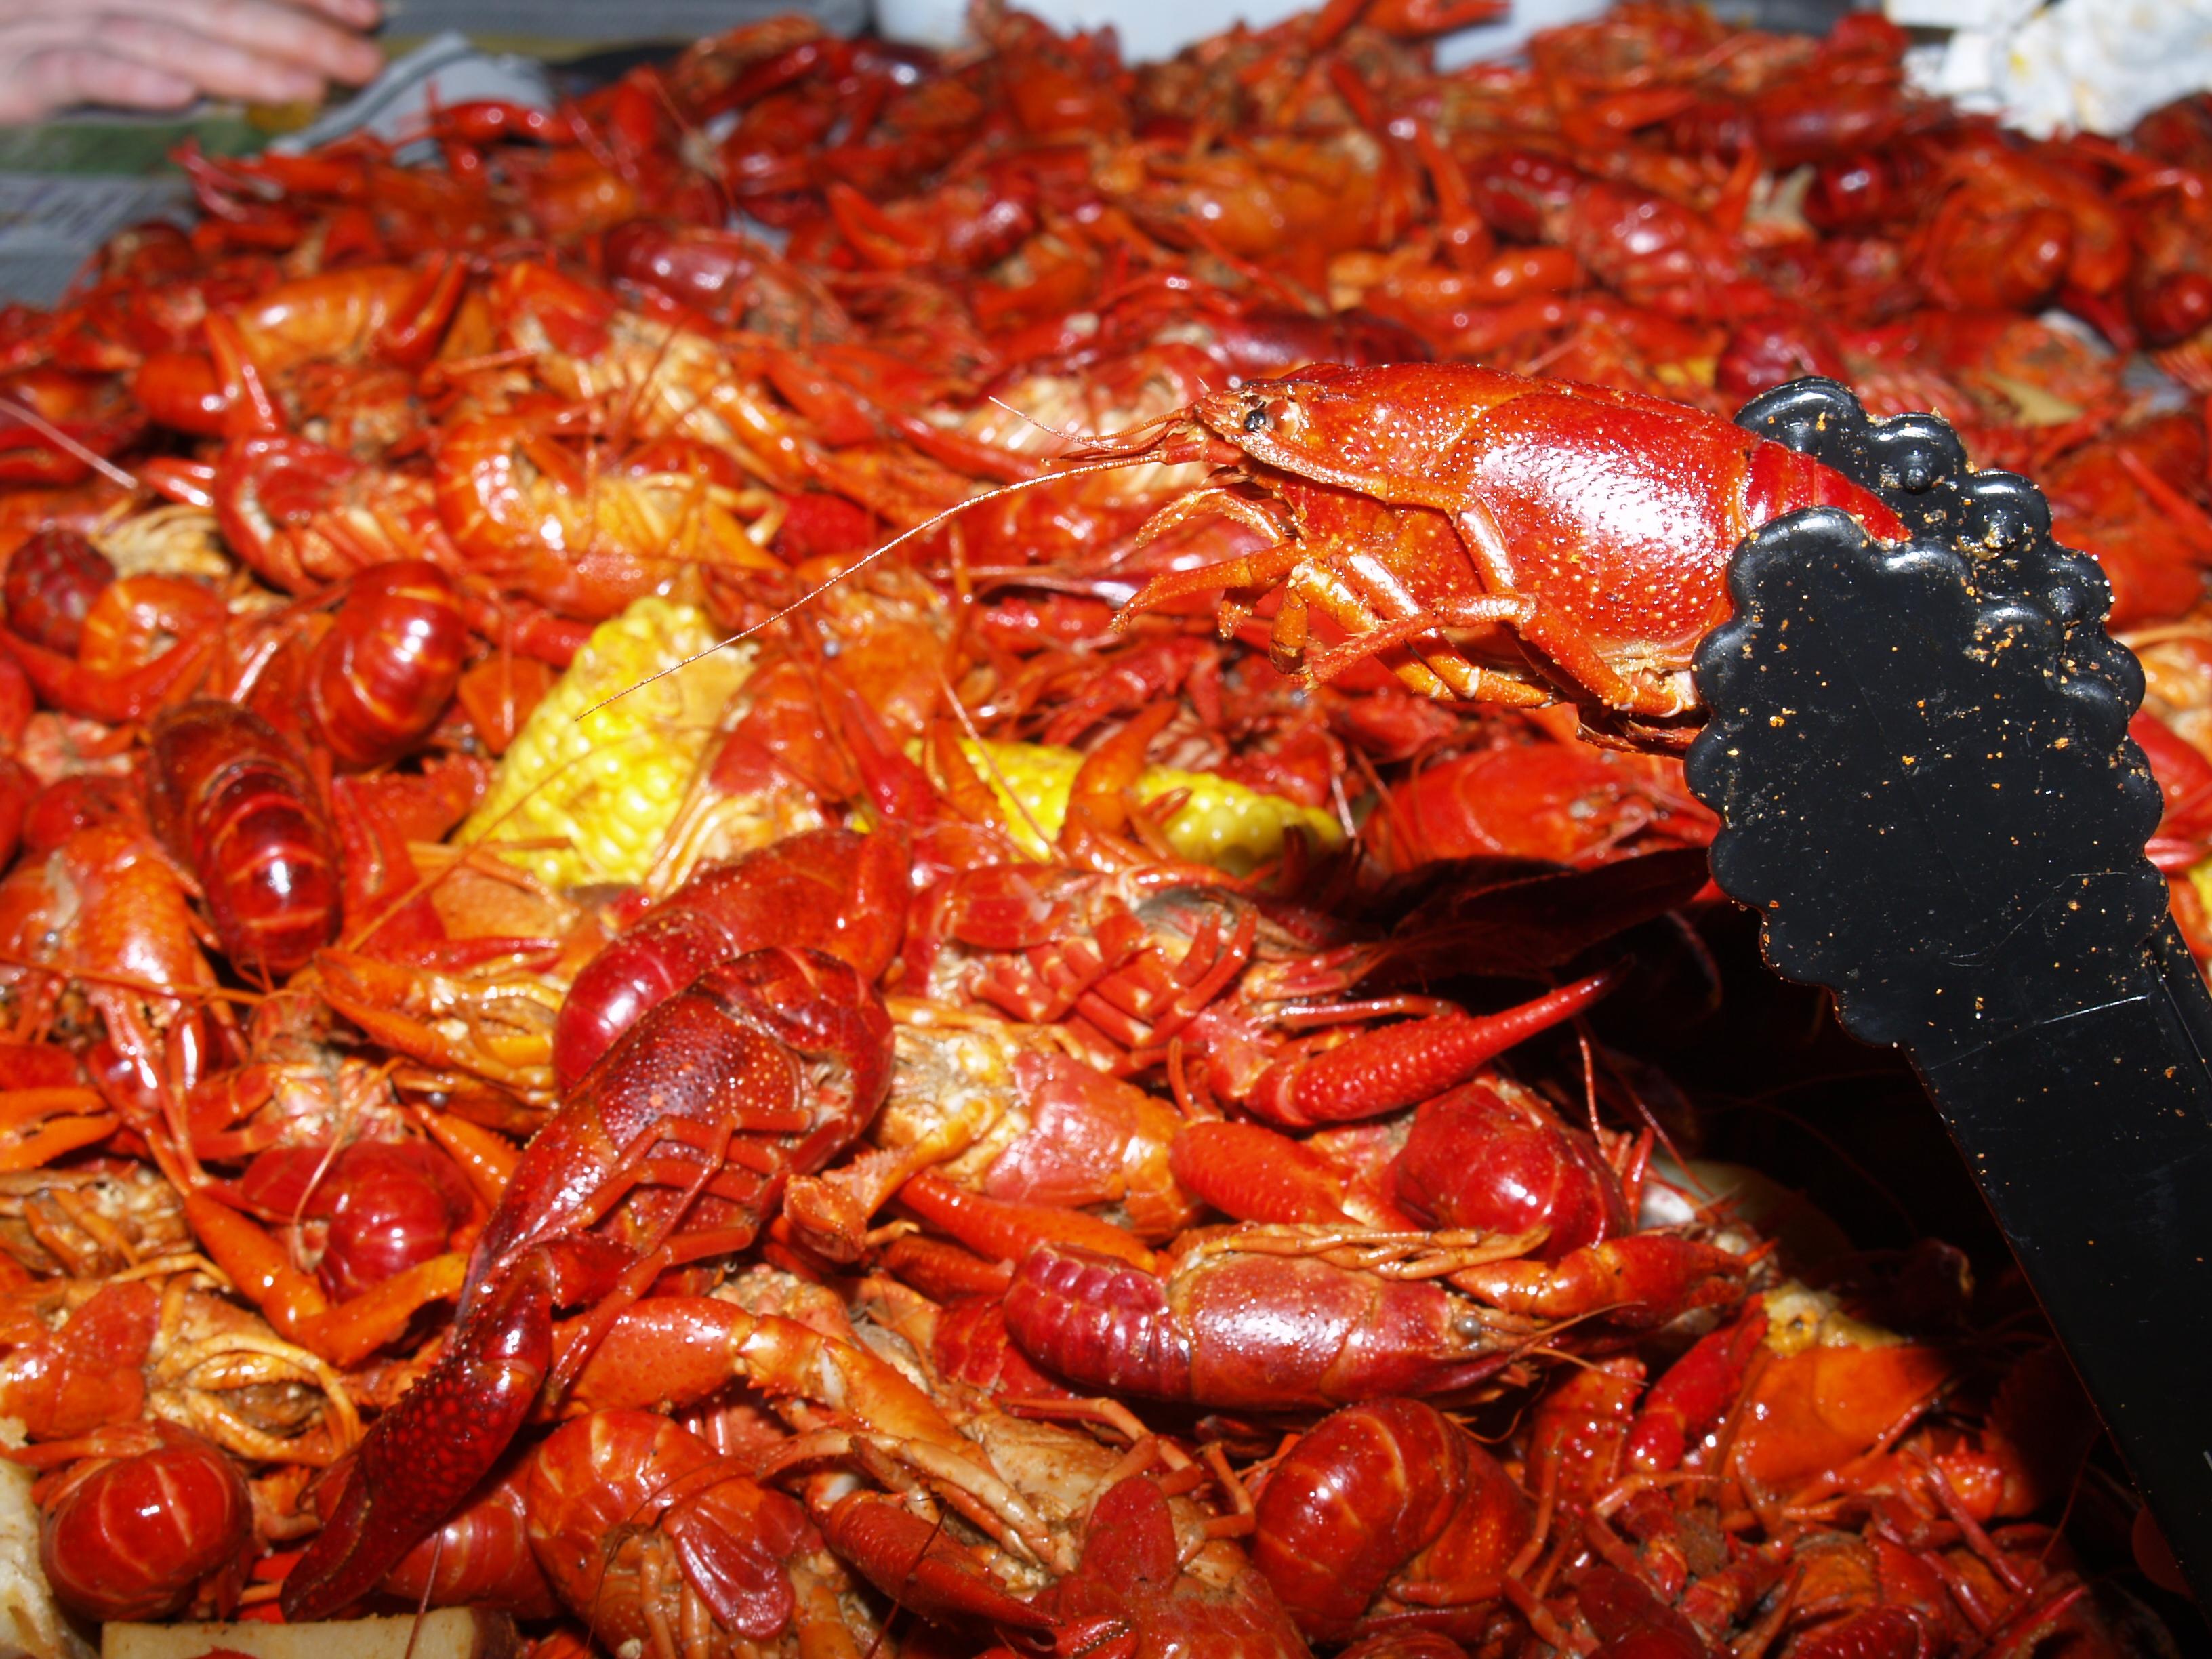 louisiana crawfish boil seasoning instructions